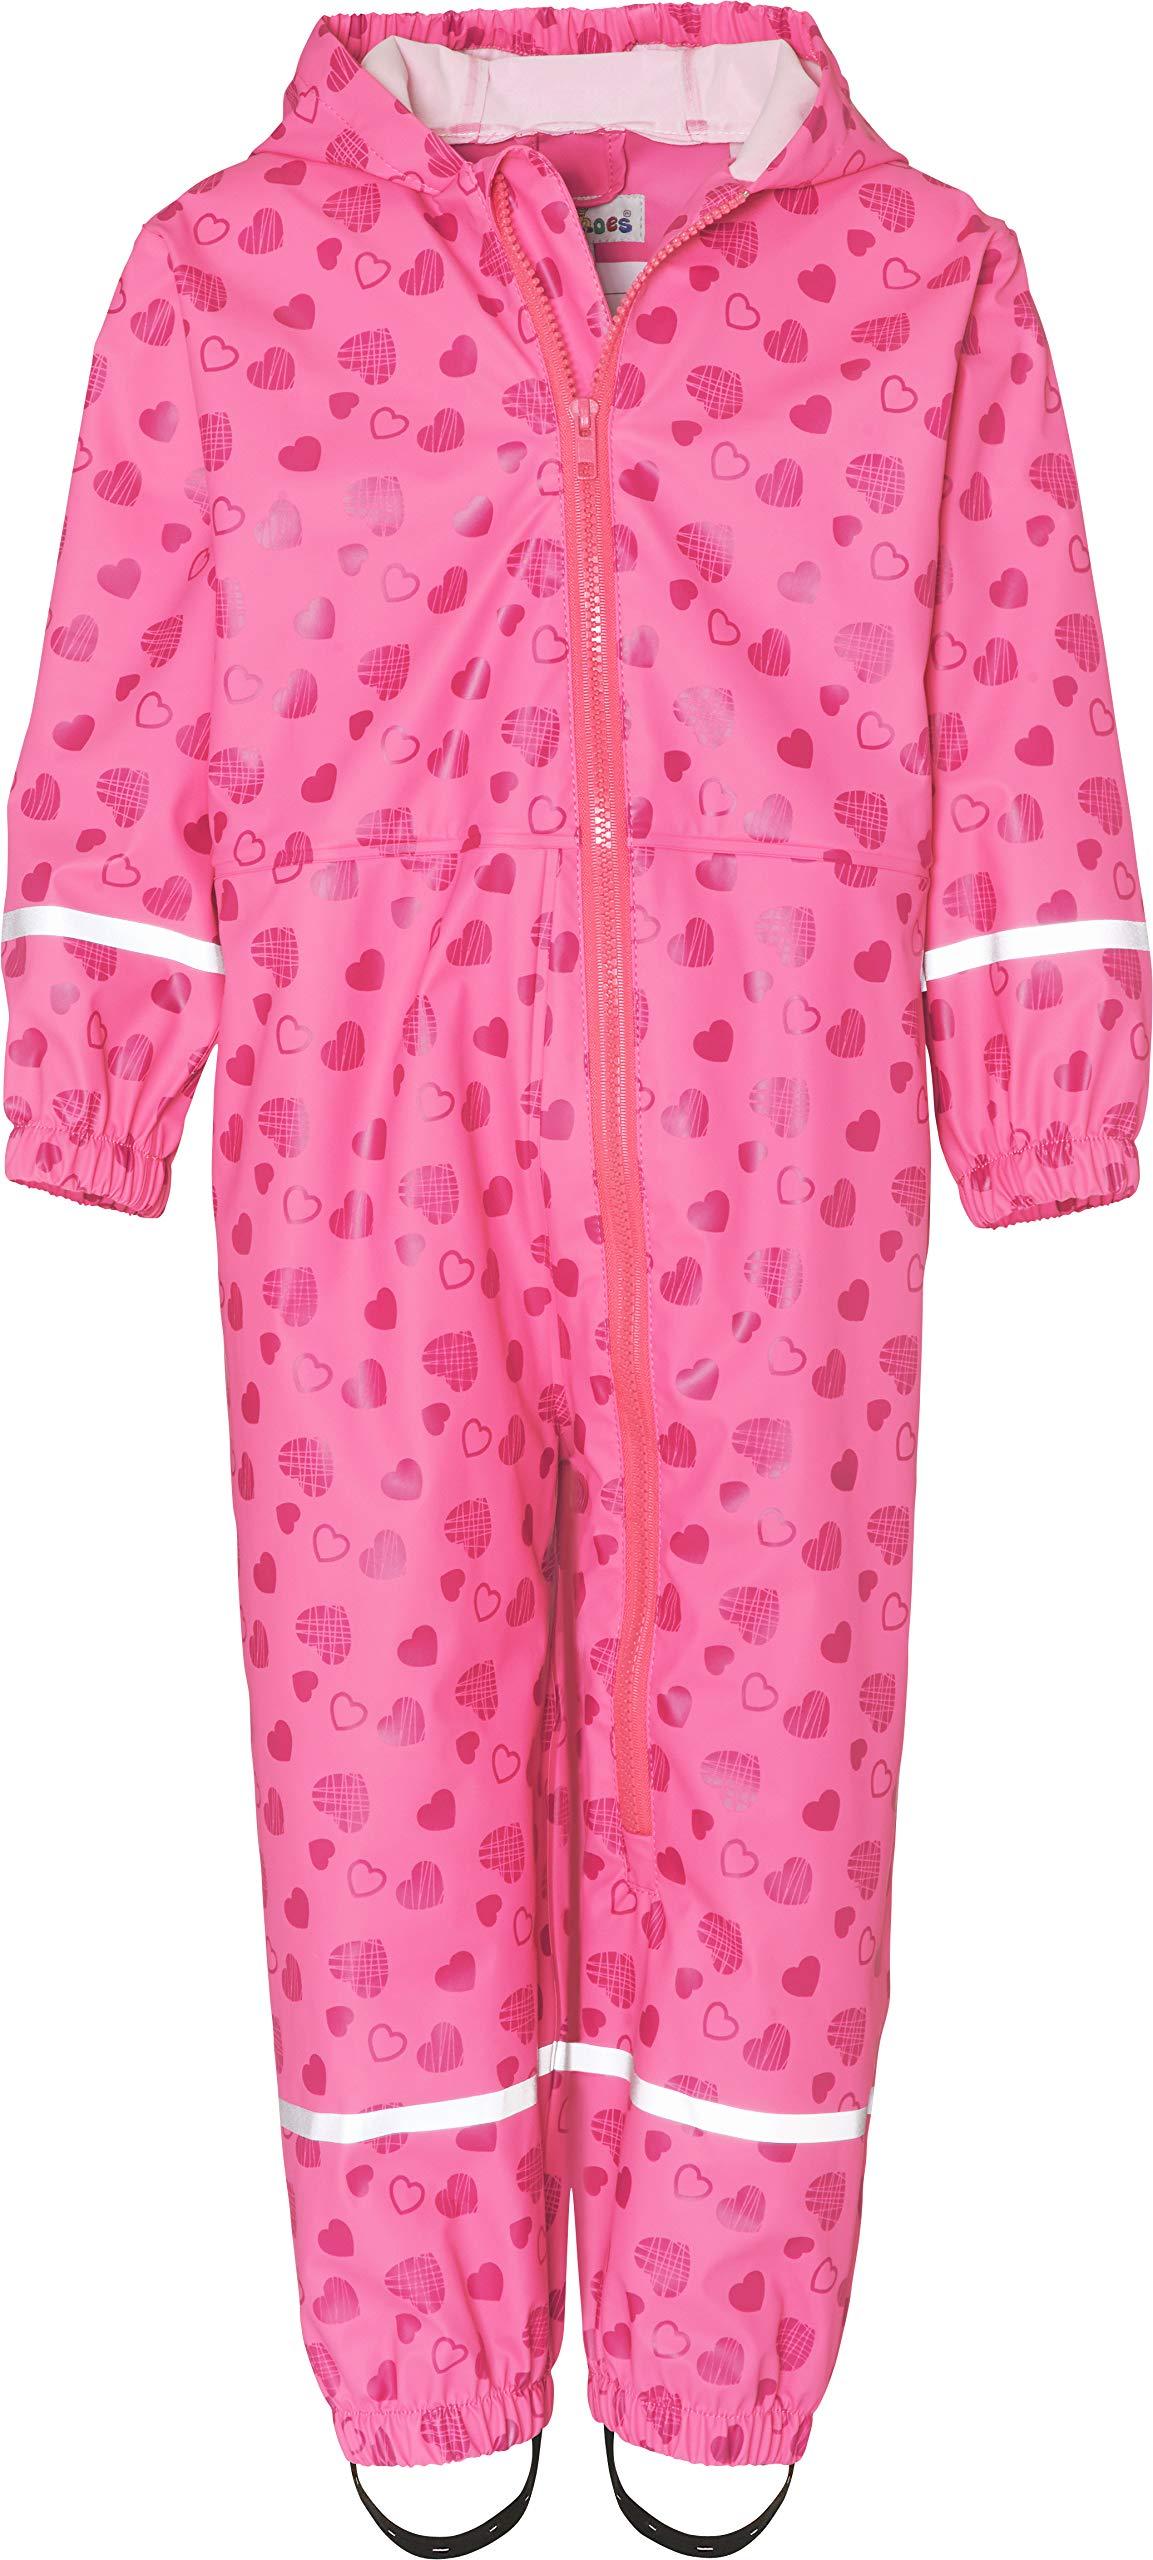 Playshoes Regen-Overall Herzchen Allover Pantalones Impermeable para Bebés 1